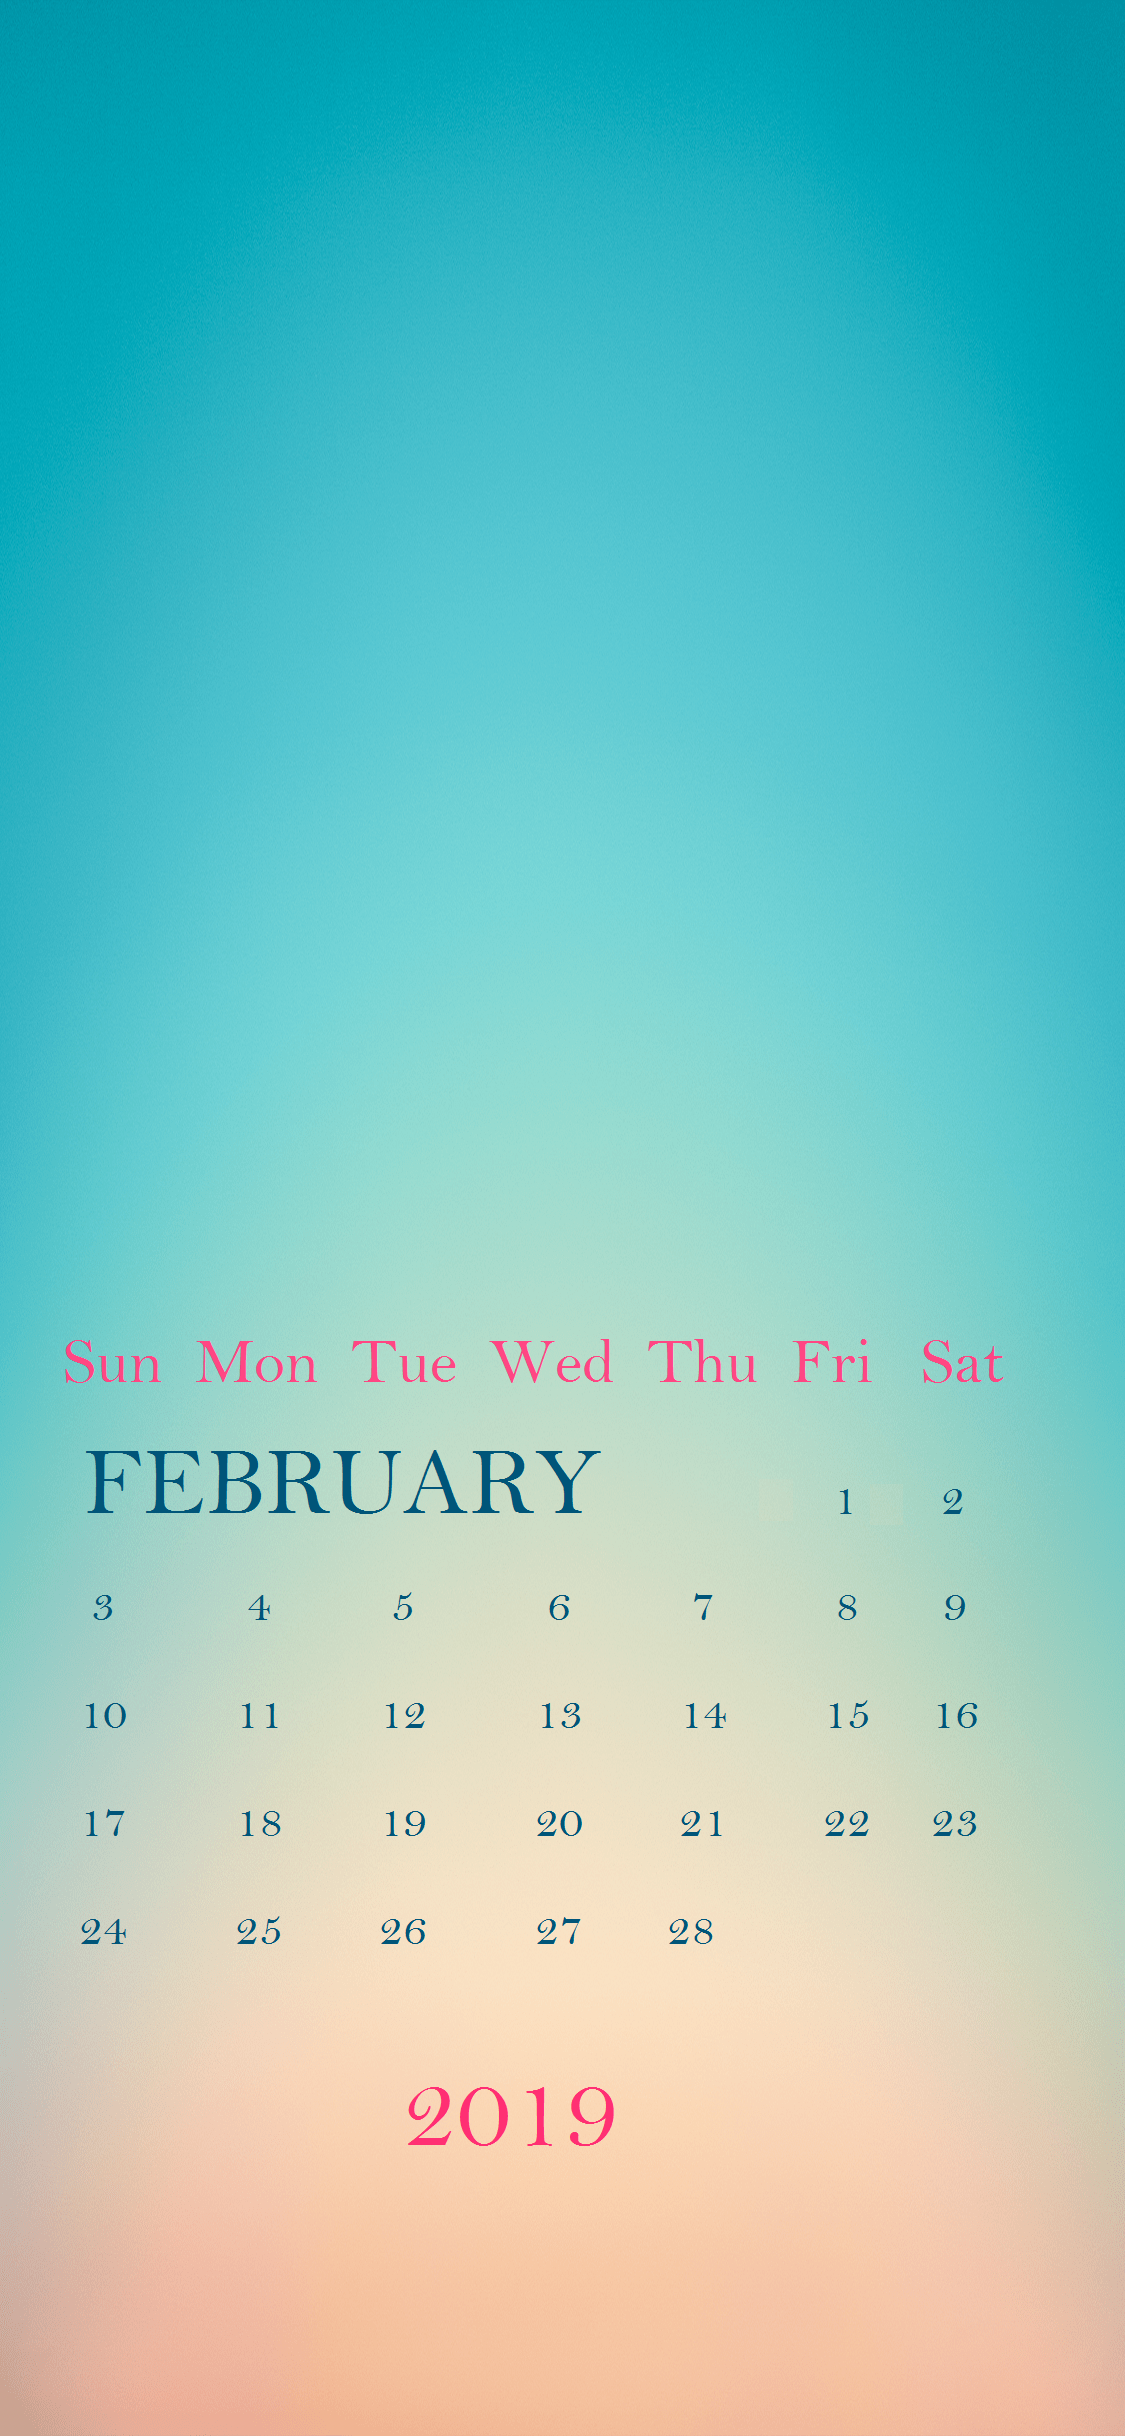 Mac Calendar Background February 2019 Beautiful February 2019 Calendar Wallpapers For Mac iPod